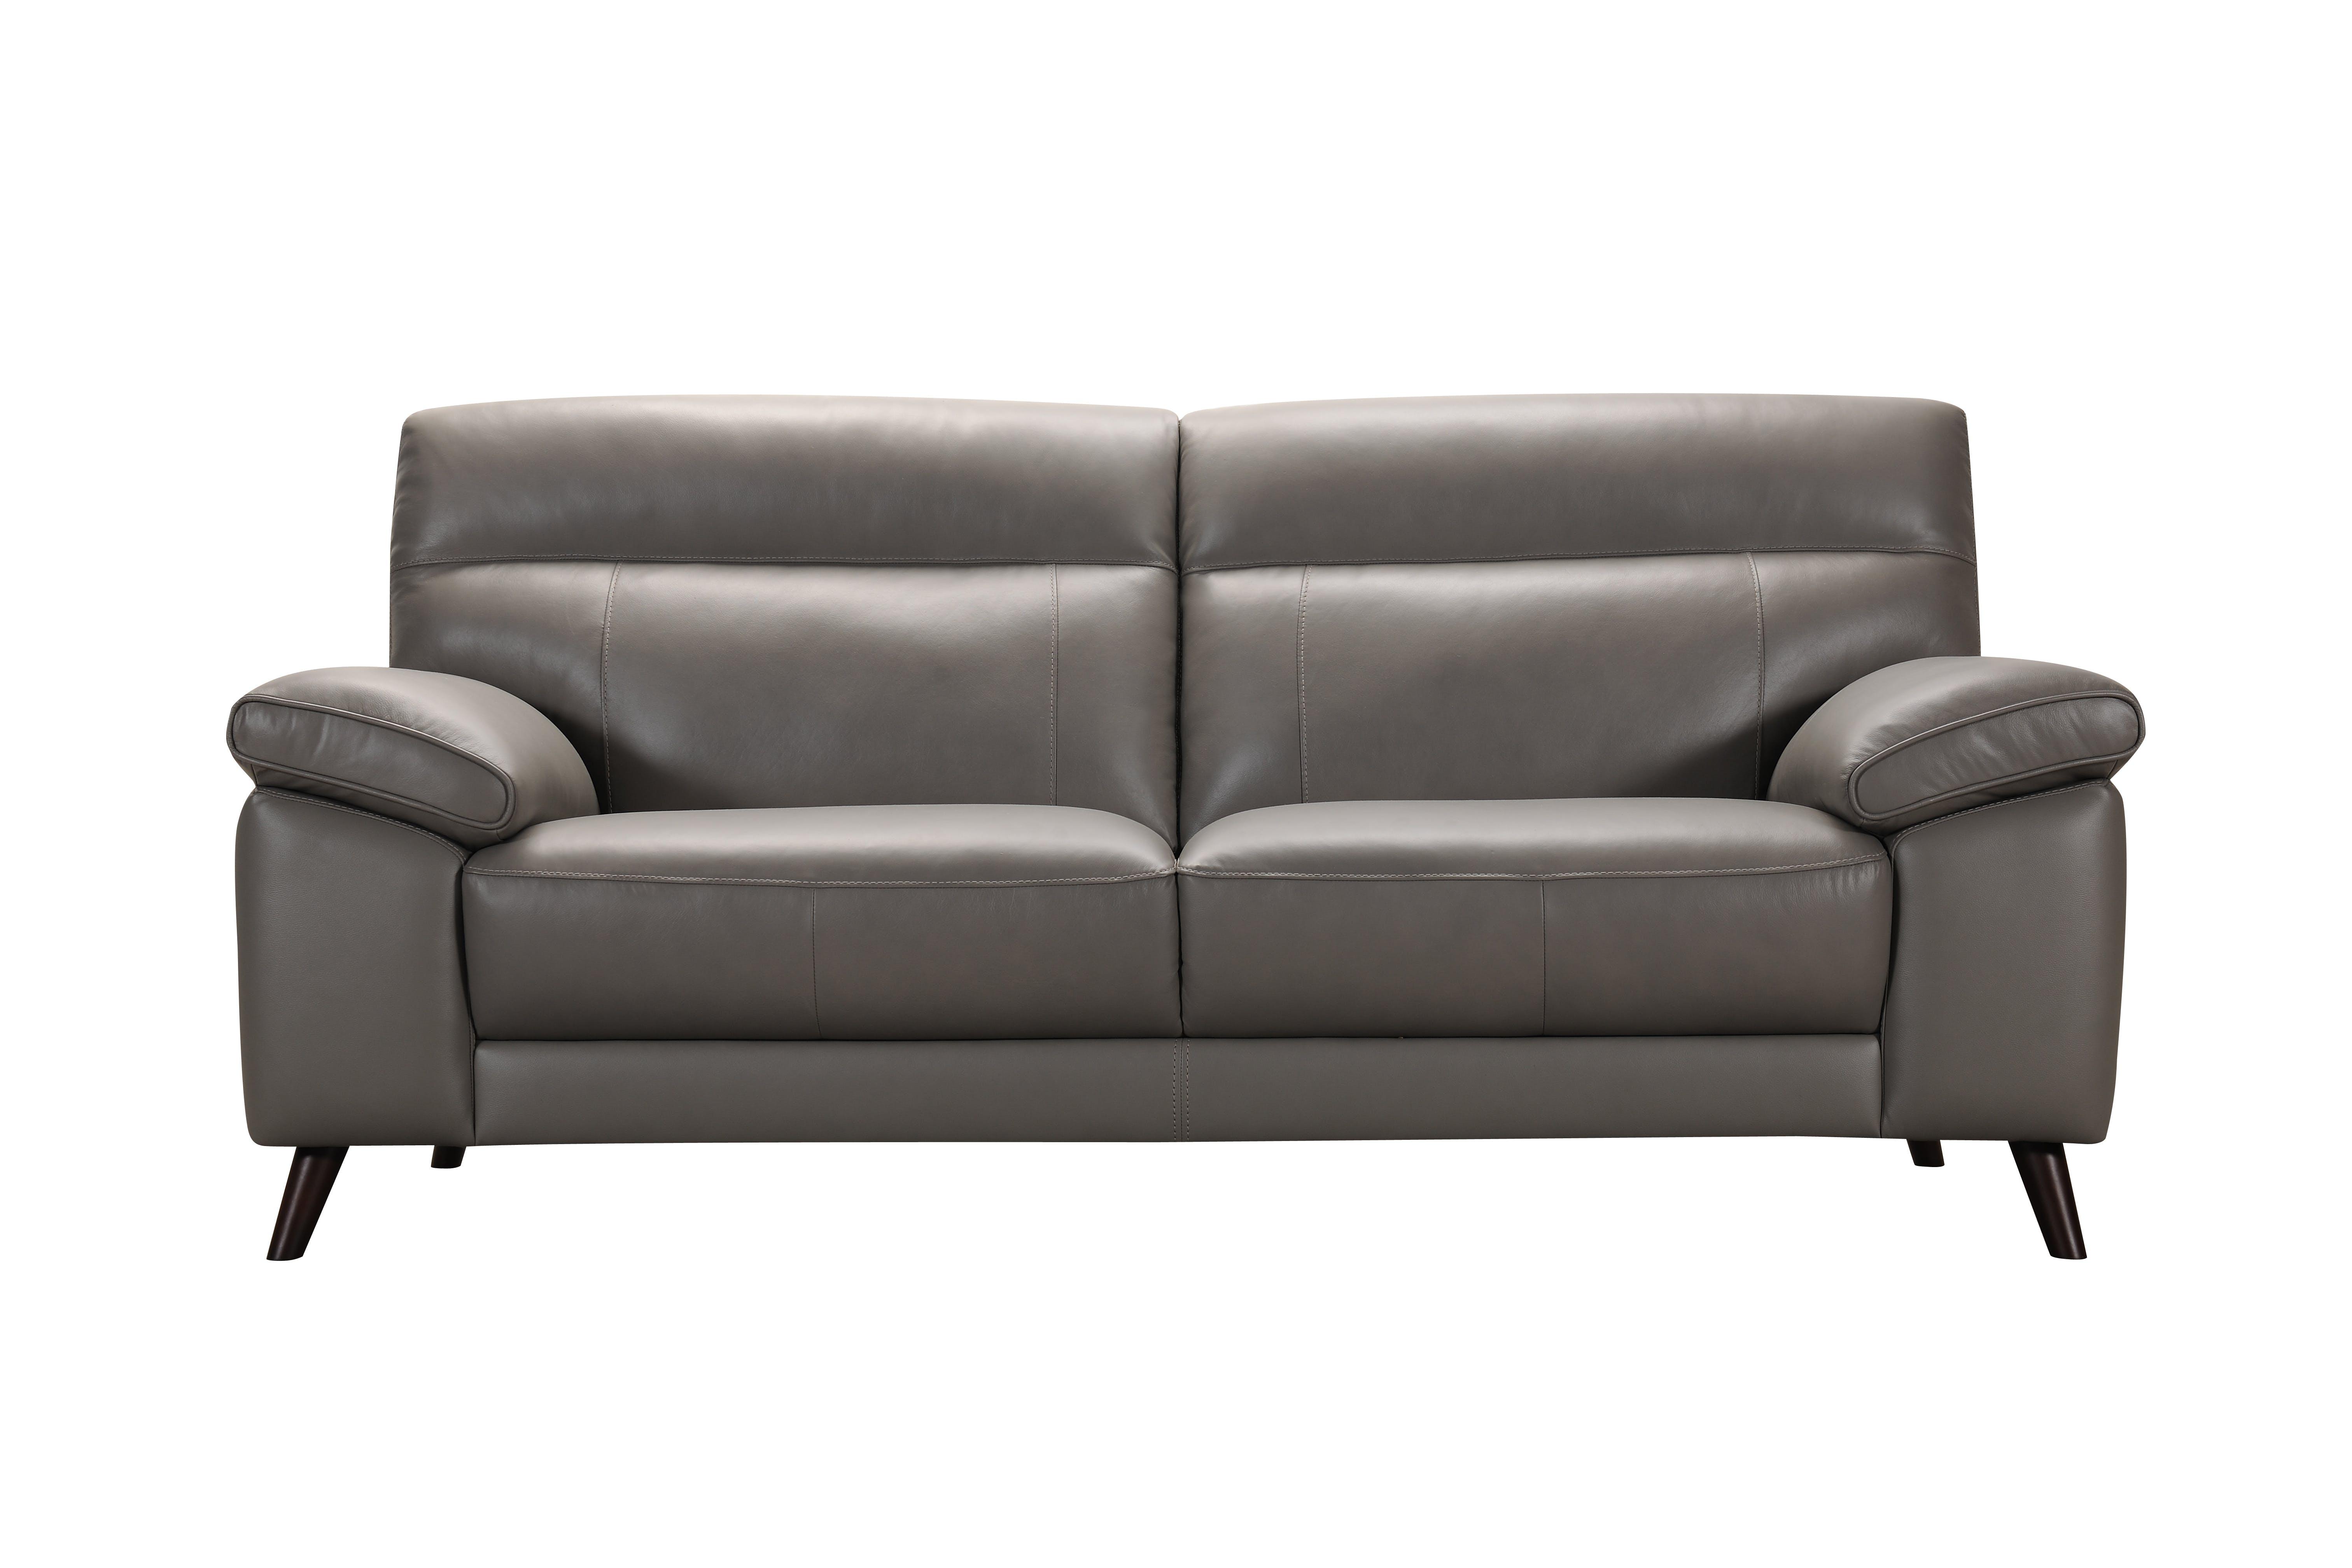 Super Leather Sofas Harvey Norman Ireland Ibusinesslaw Wood Chair Design Ideas Ibusinesslaworg